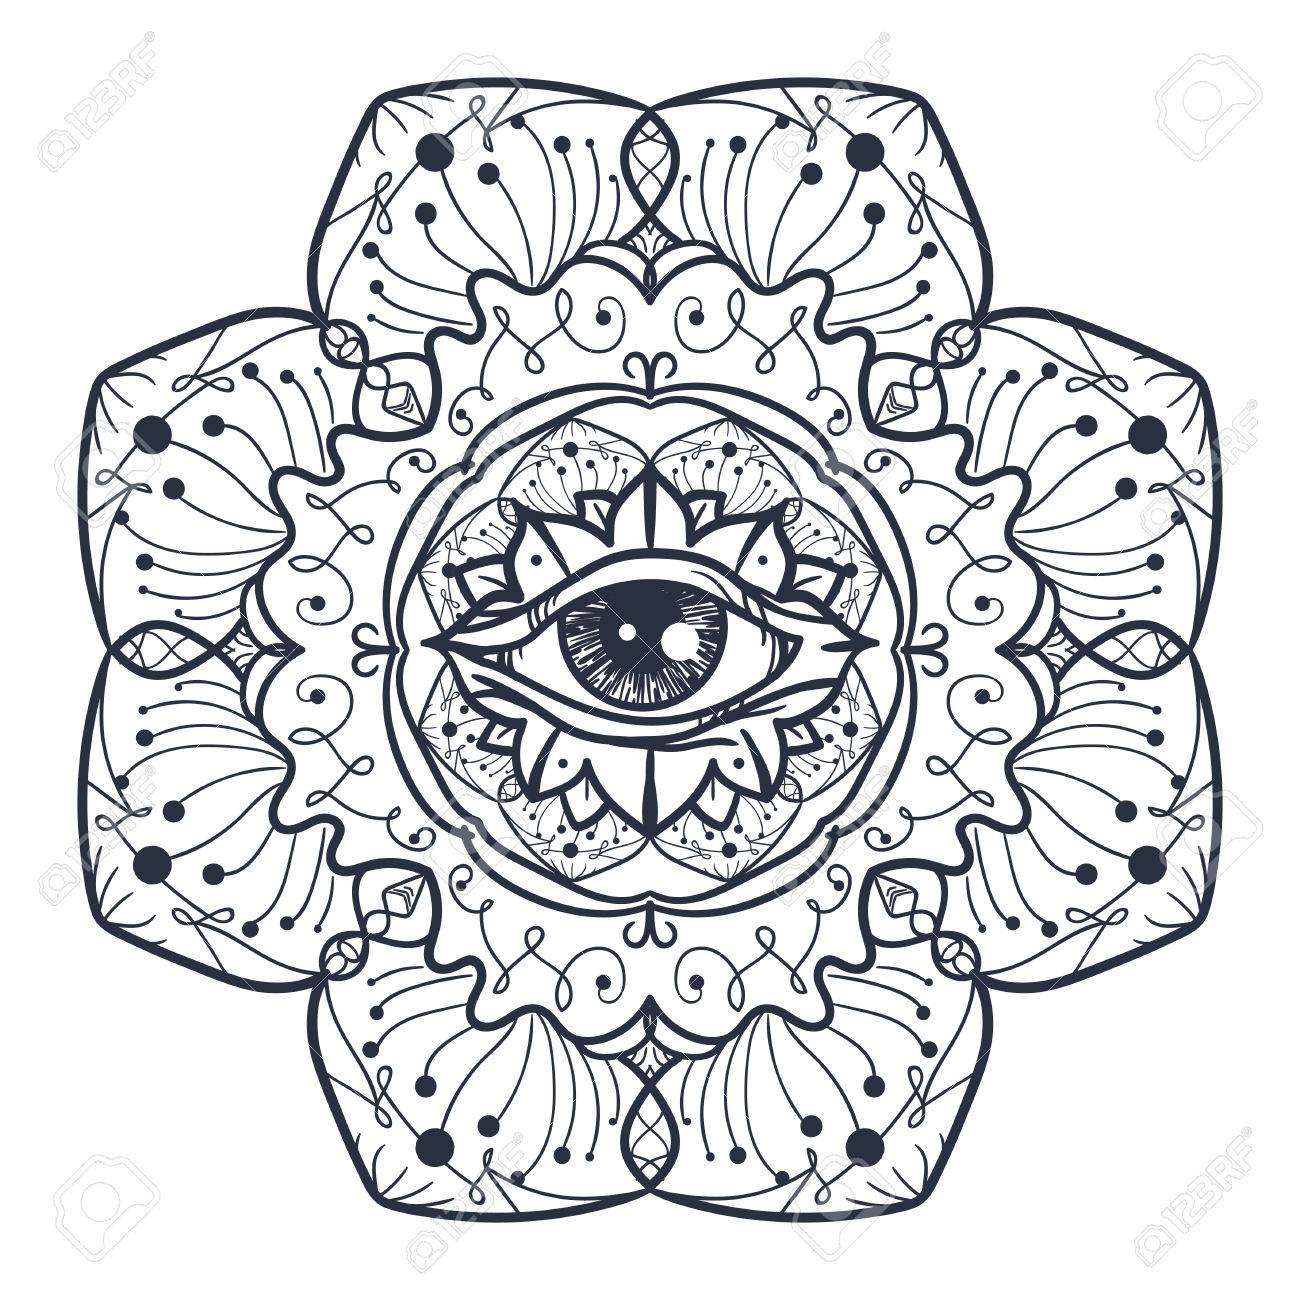 Vintage All Seeing Eye En Mandala. Providencia Símbolo Mágico Para ...